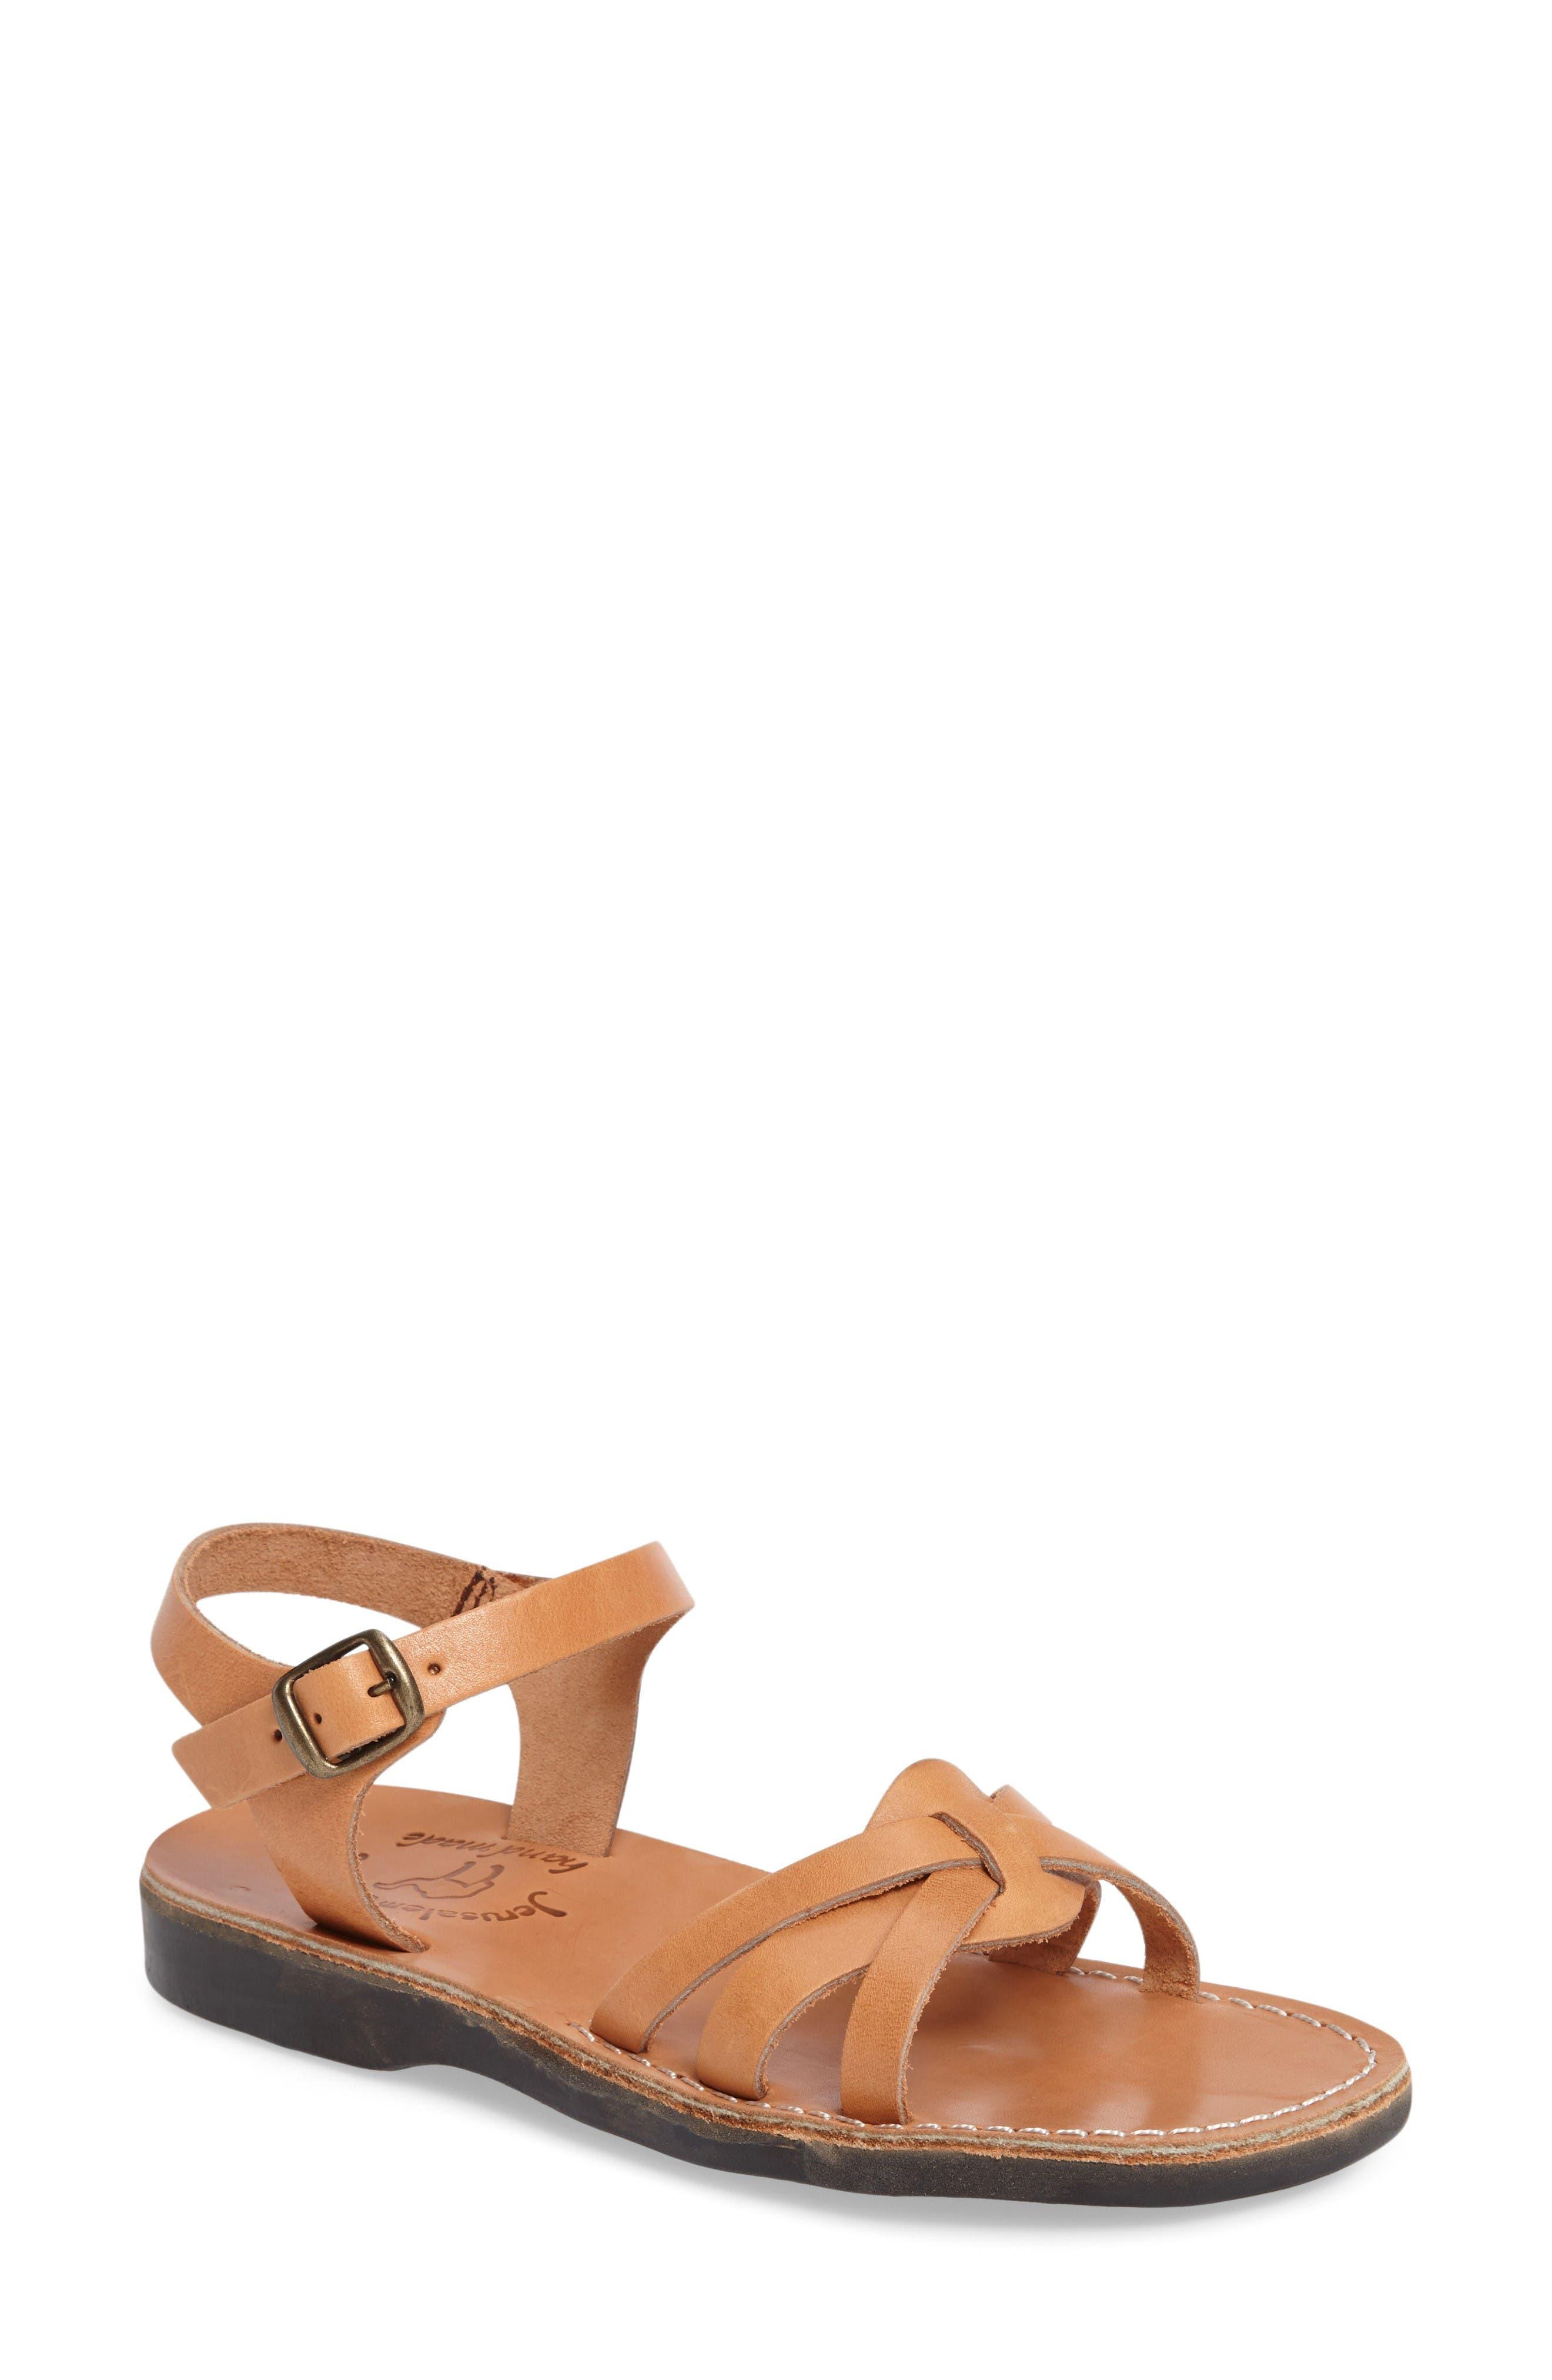 Alternate Image 1 Selected - Jerusalem Sandals Miriam Sandal (Women)